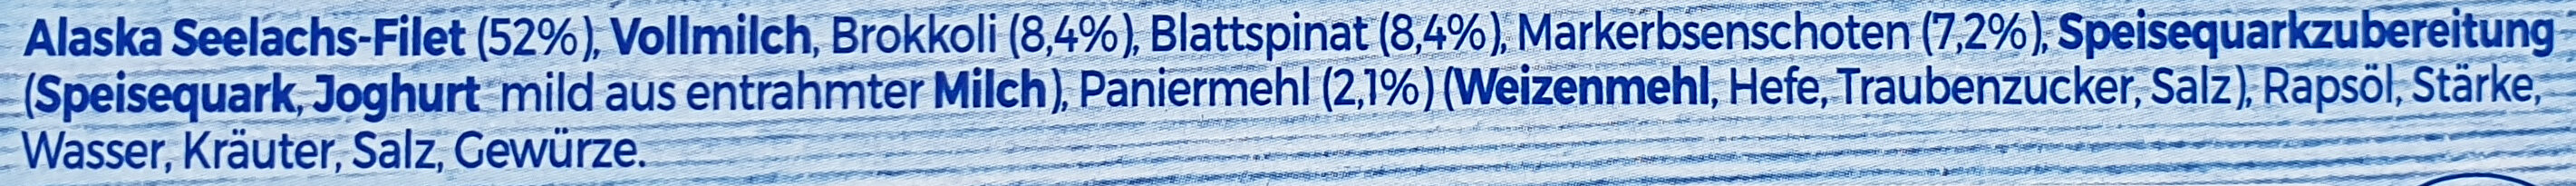 Schlemmer-Filet Grünes Gemüse - Brokkoli, Blattspinat, Erbenschoten - Ingrédients - de